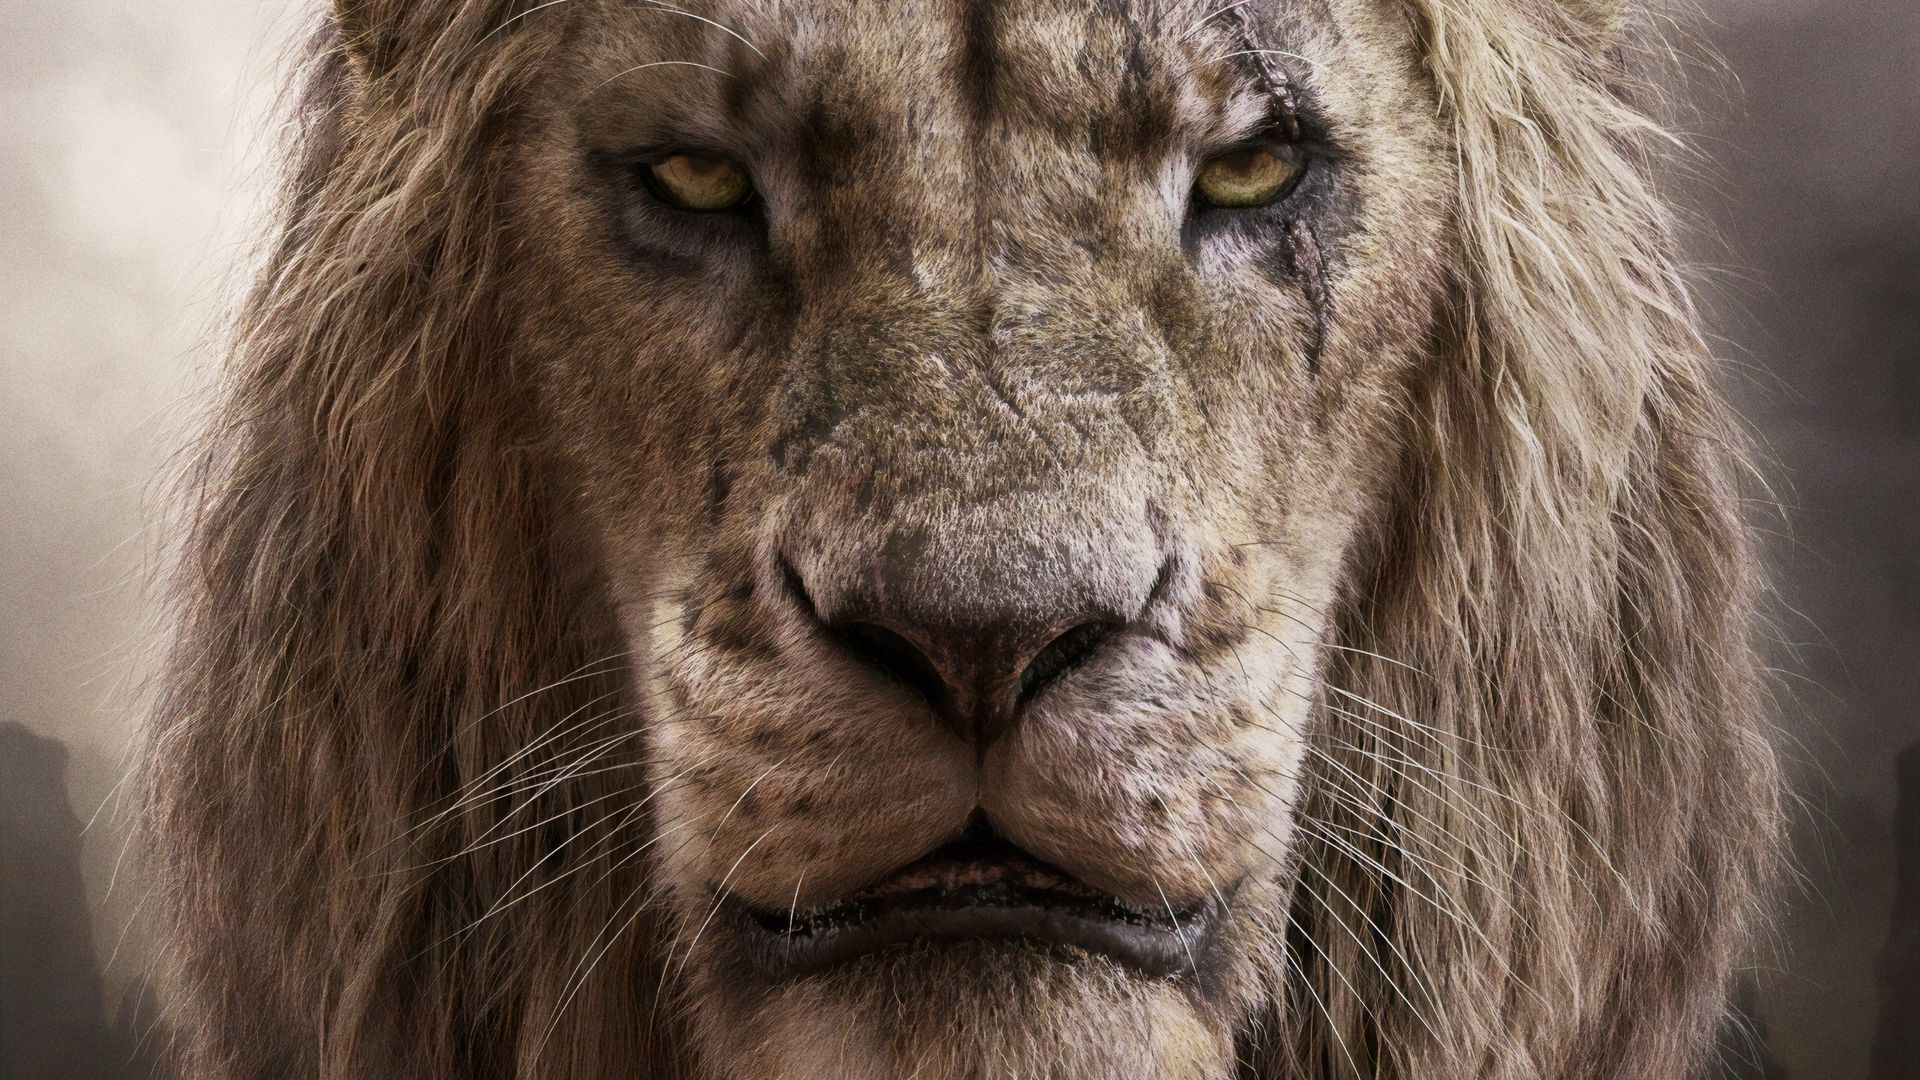 böser löwe